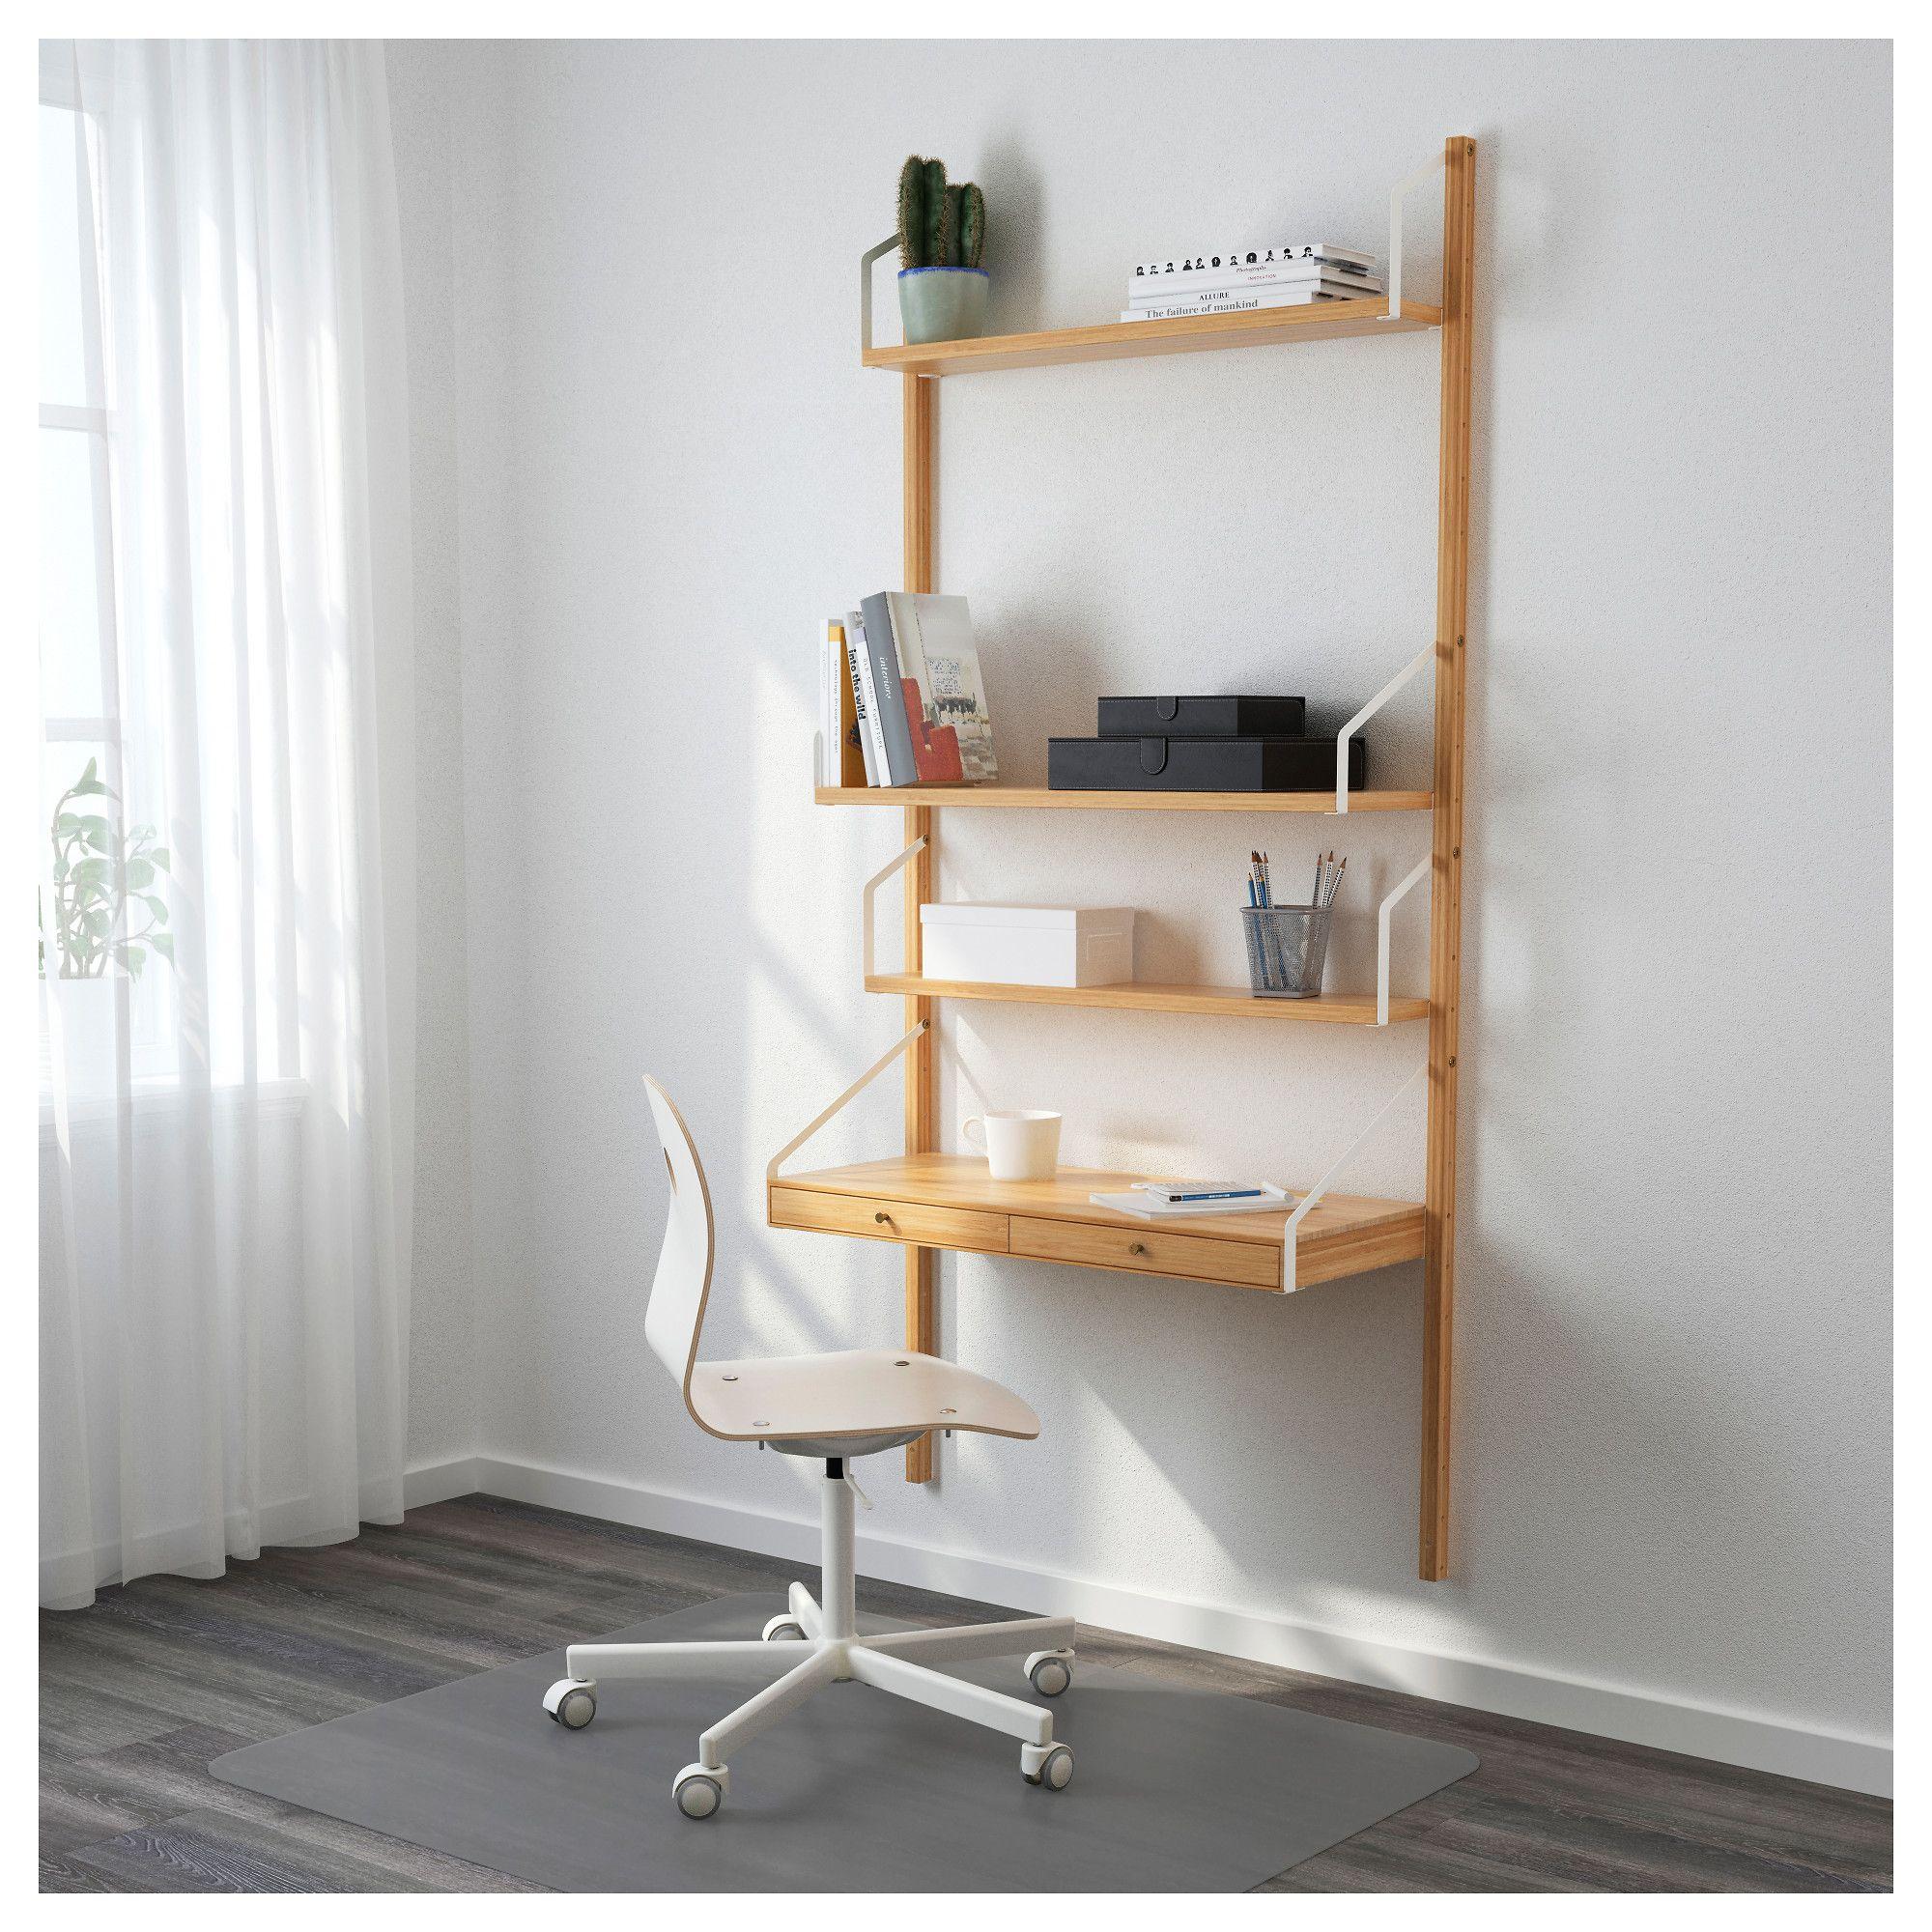 Ikea Svalnas Wall Mounted Workspace Combination Hide Or